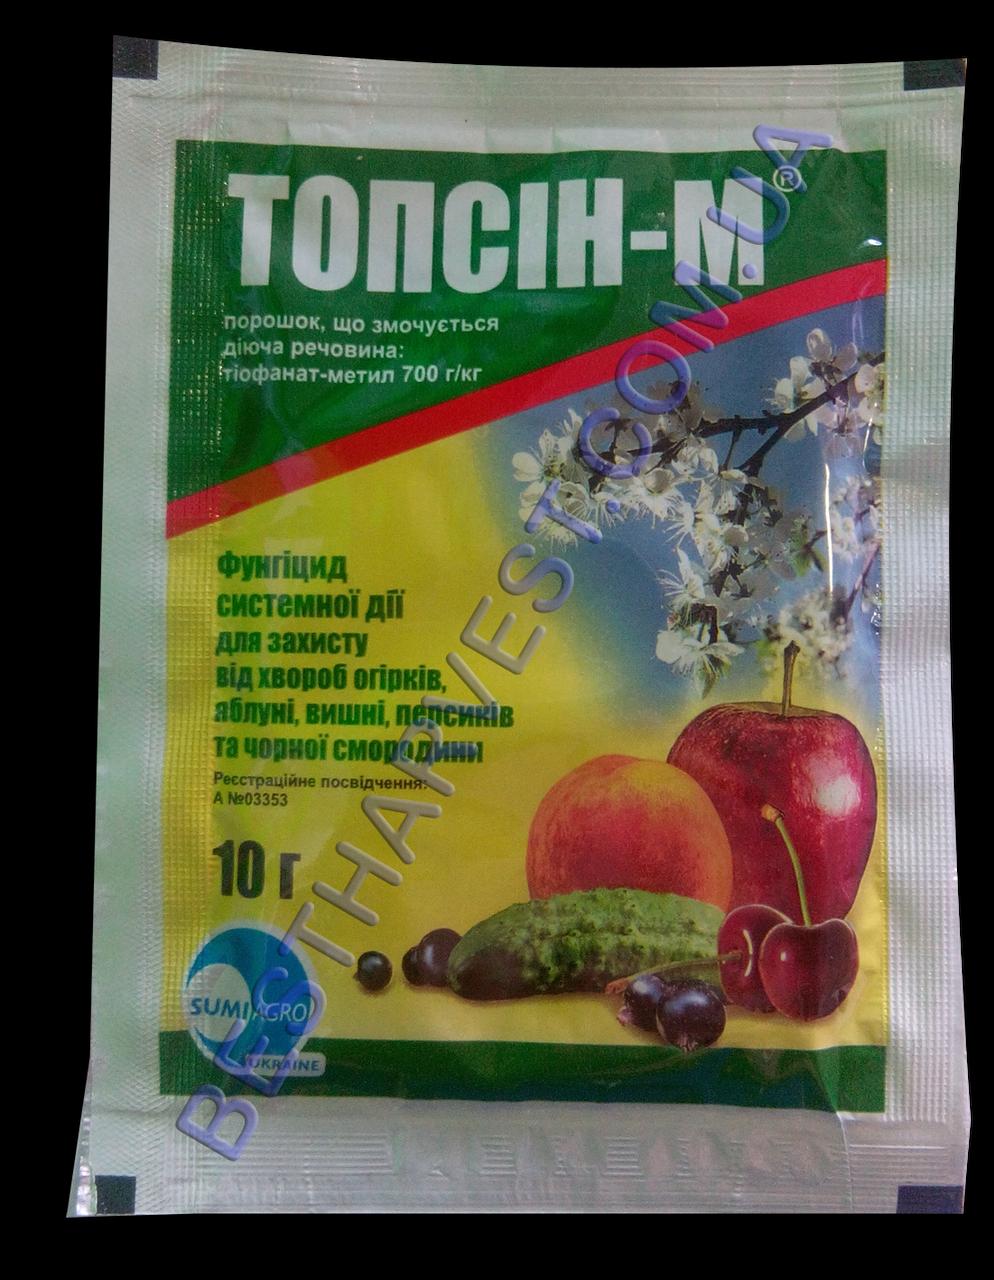 Топсин-М 10 г, оригинал